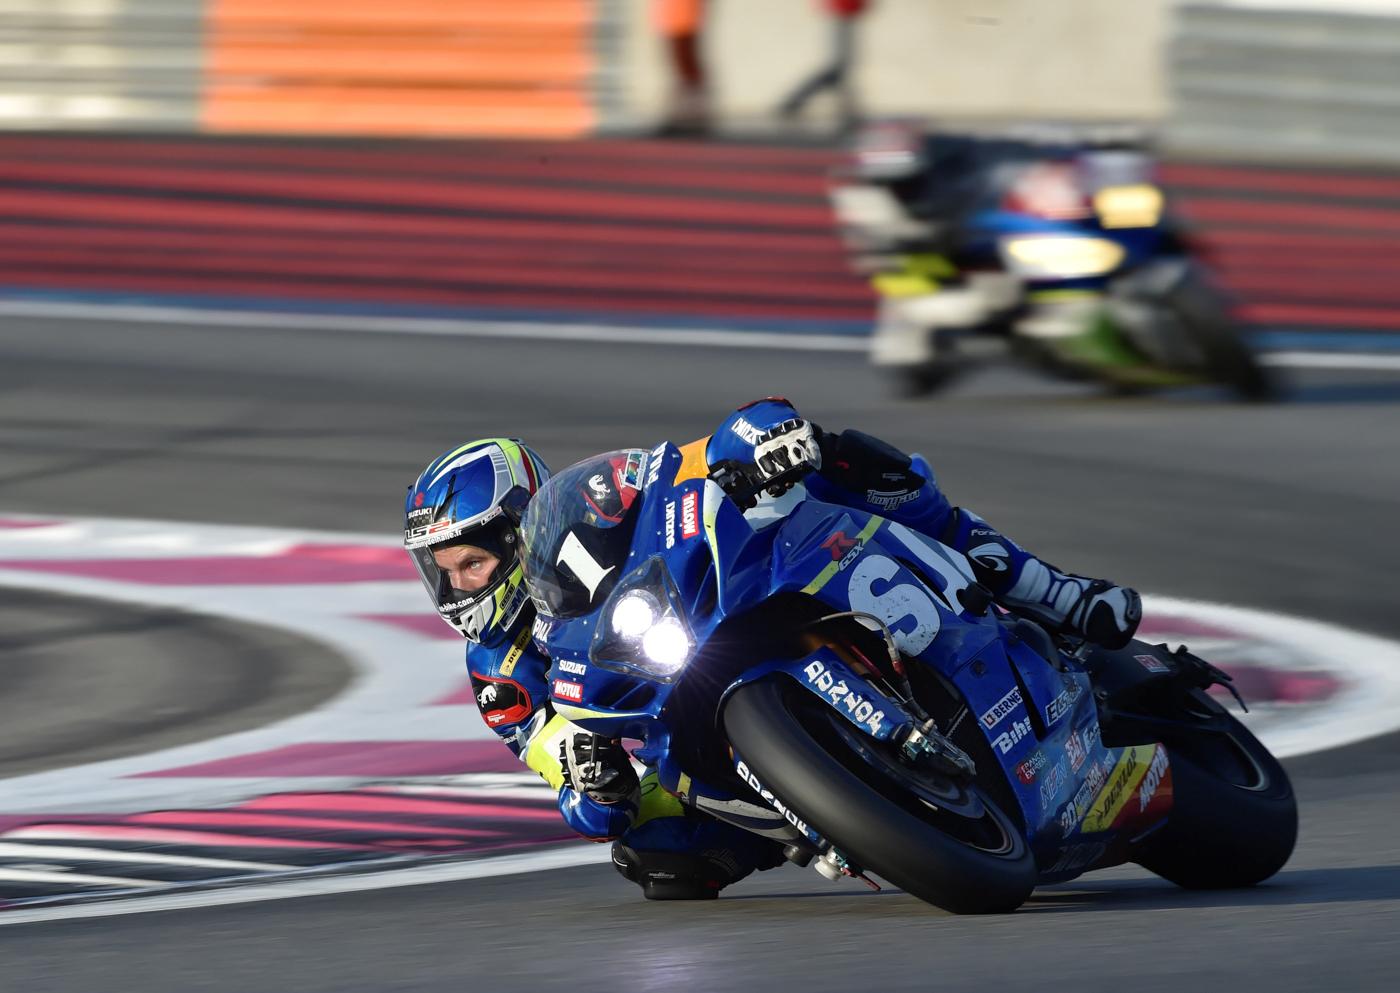 Le SERT a été intraitable au Paul Ricard. (Photo Antoine Camblor - Racingforever.com)